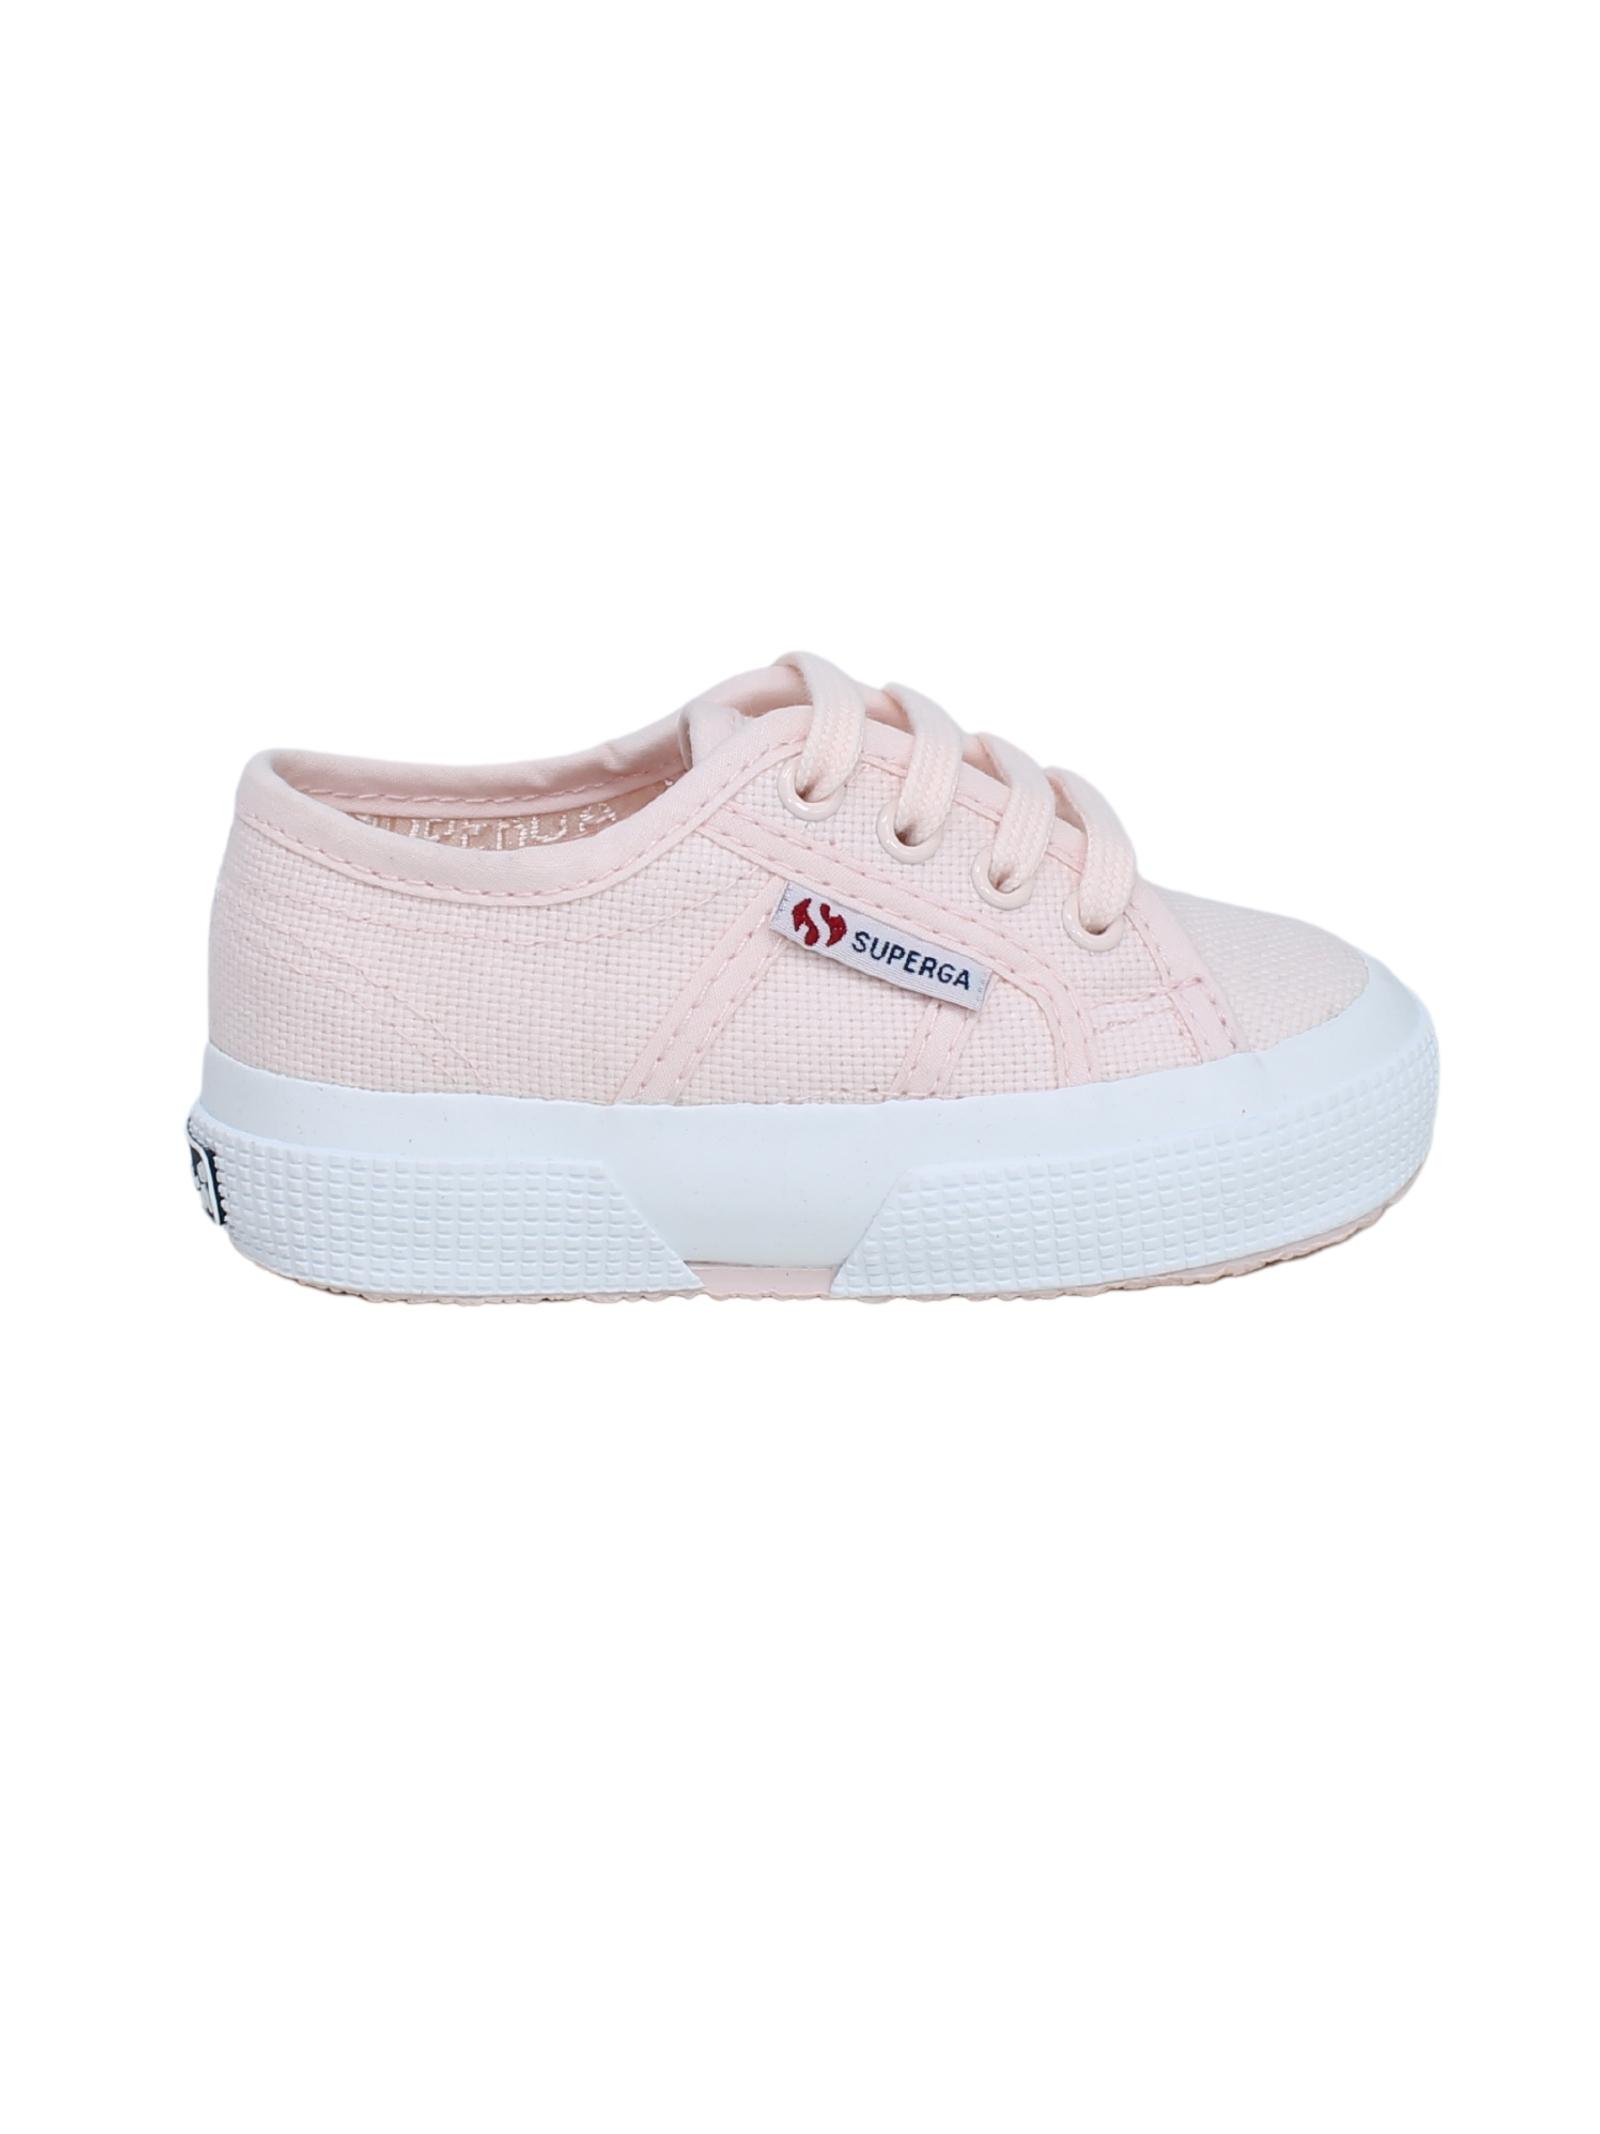 SUPERGA KIDS | Sneakers | 2750S0005PRW0I